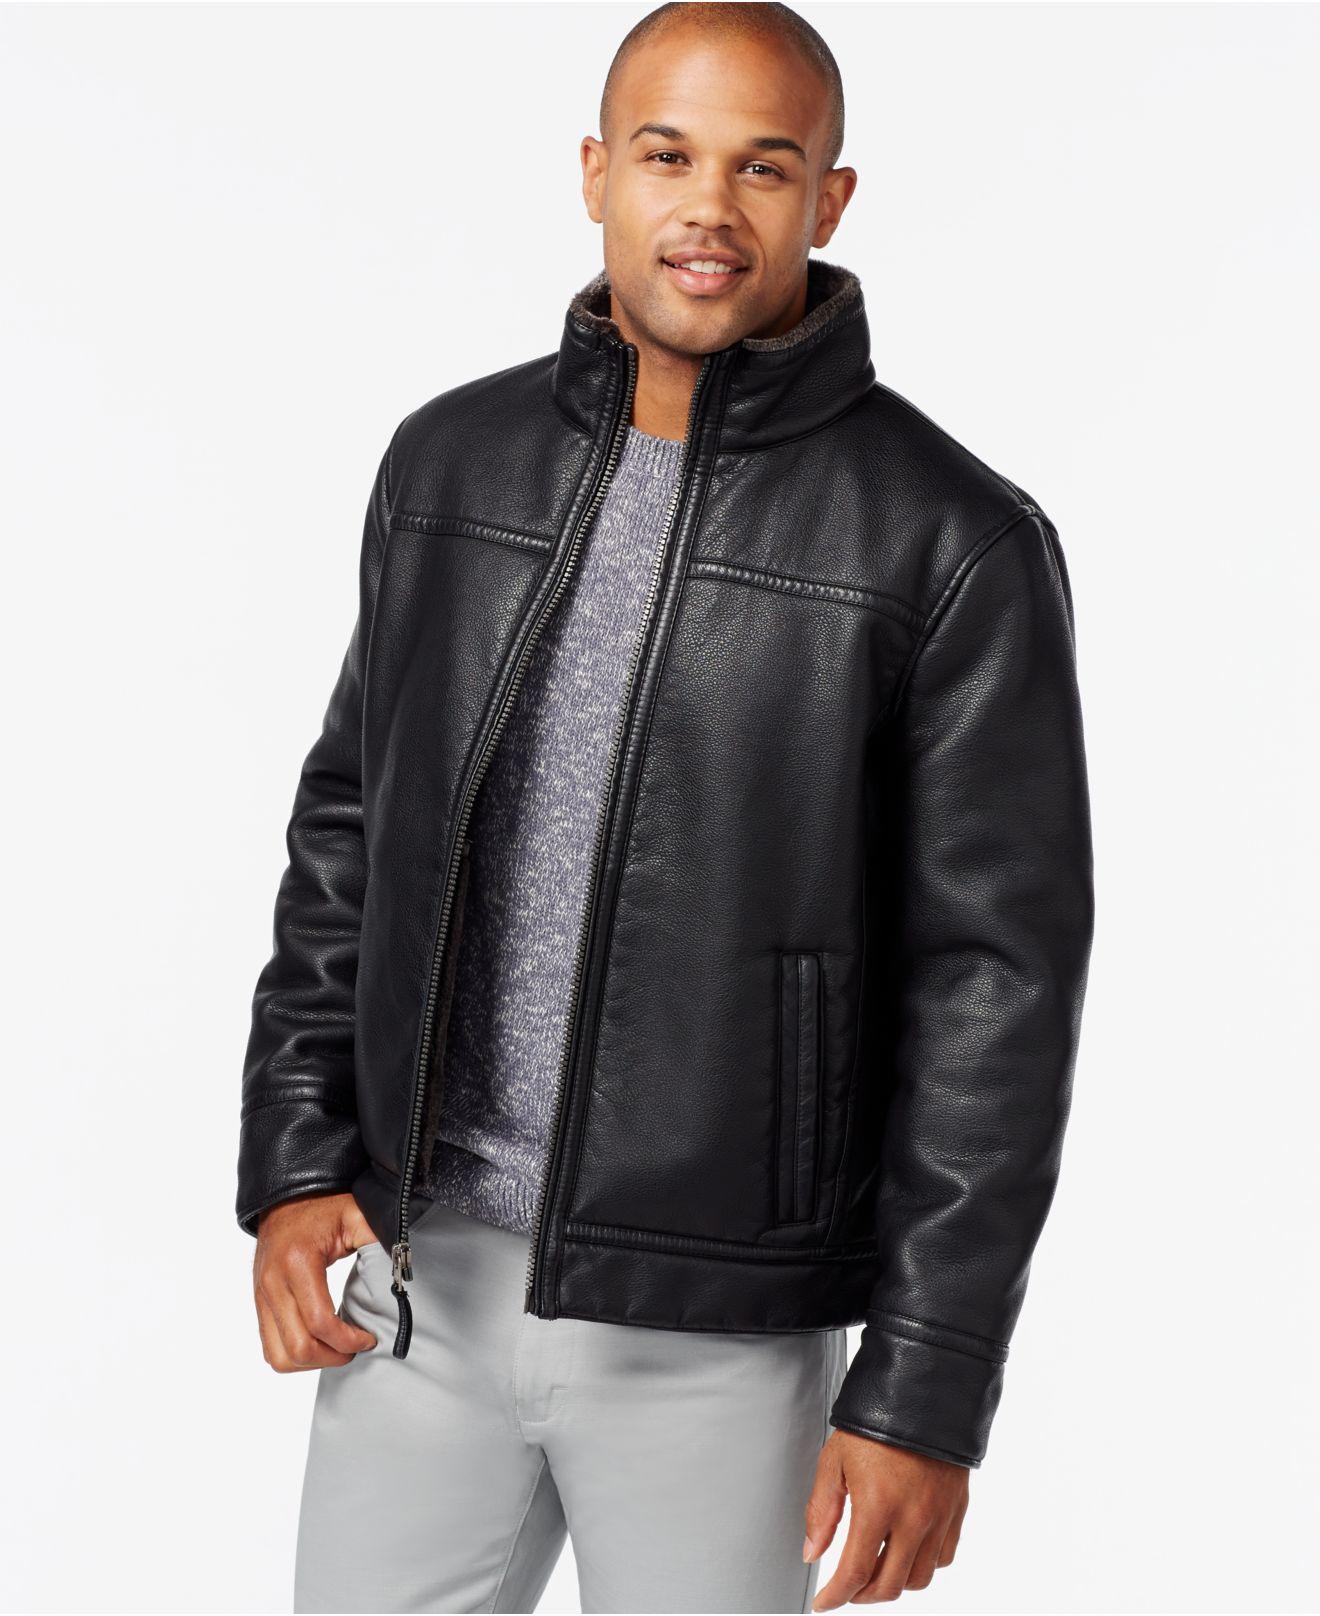 f2bb64801350 Calvin Klein Faux Leather Faux-shearling Jacket in Black for Men - Lyst